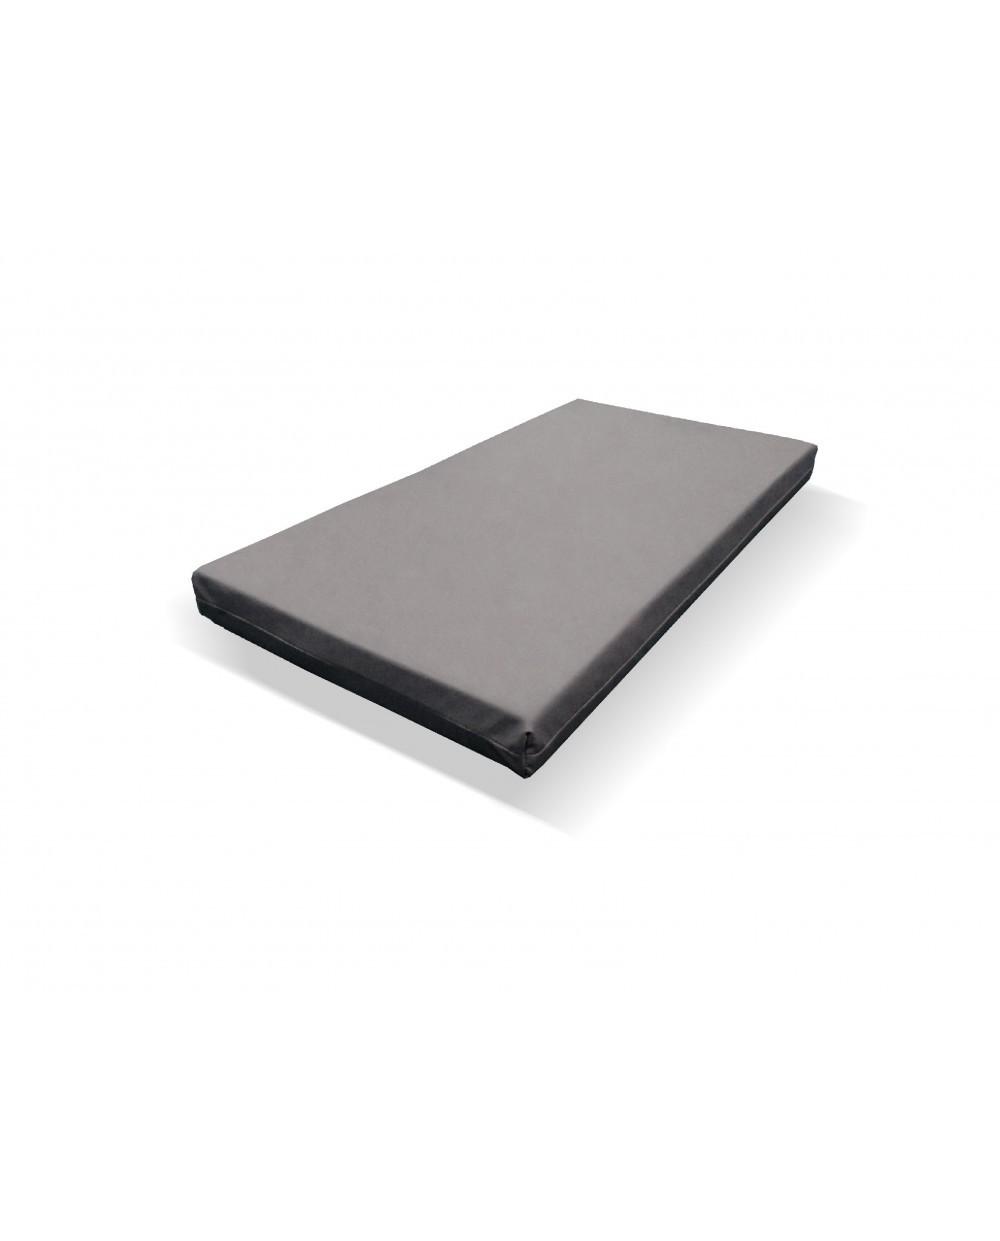 matelas 120 x 60 cm villard. Black Bedroom Furniture Sets. Home Design Ideas